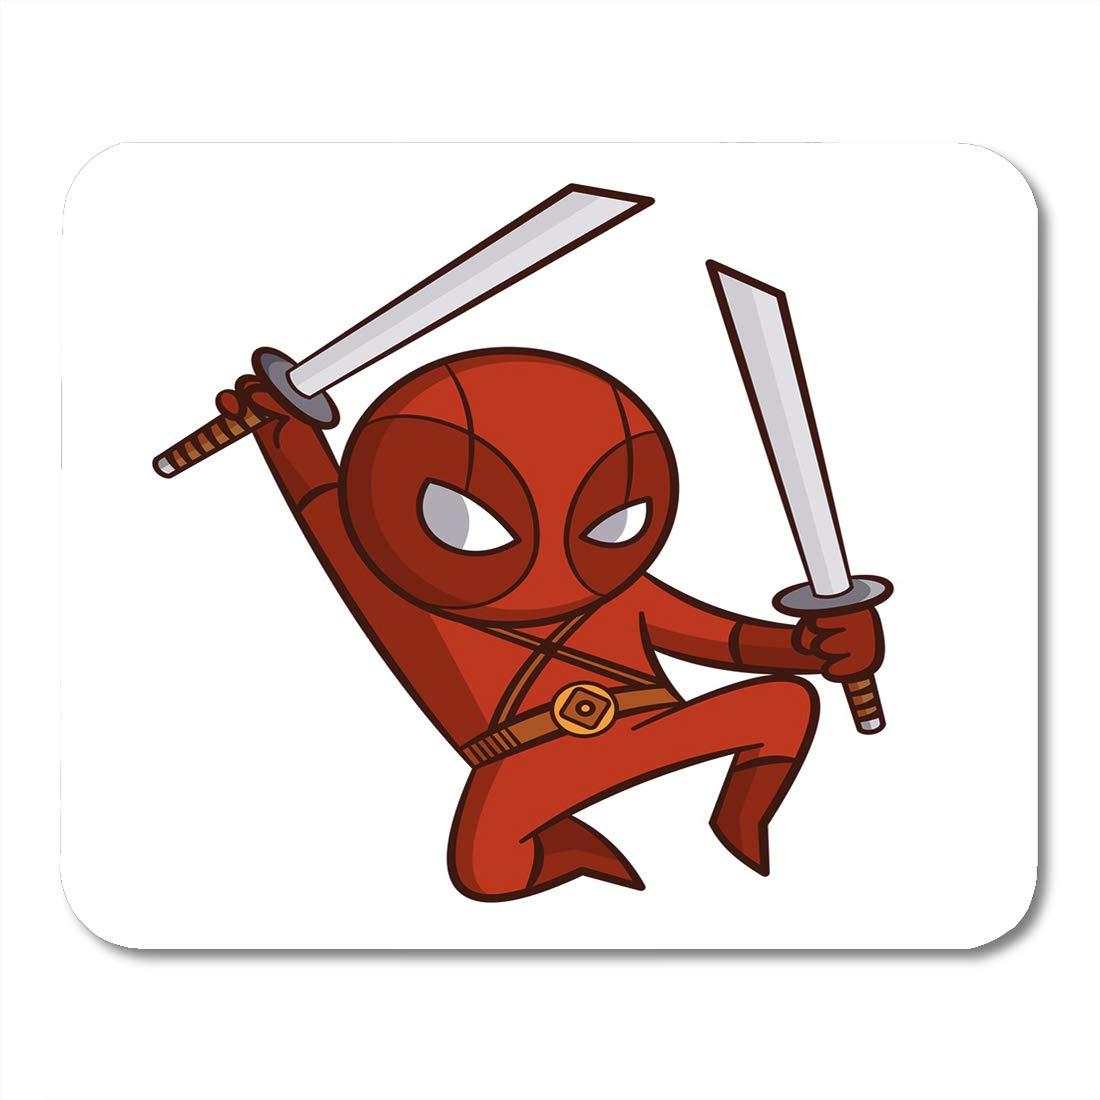 Amazon.com : Emvency Mouse Pads Super Black Hero Red Ninja ...